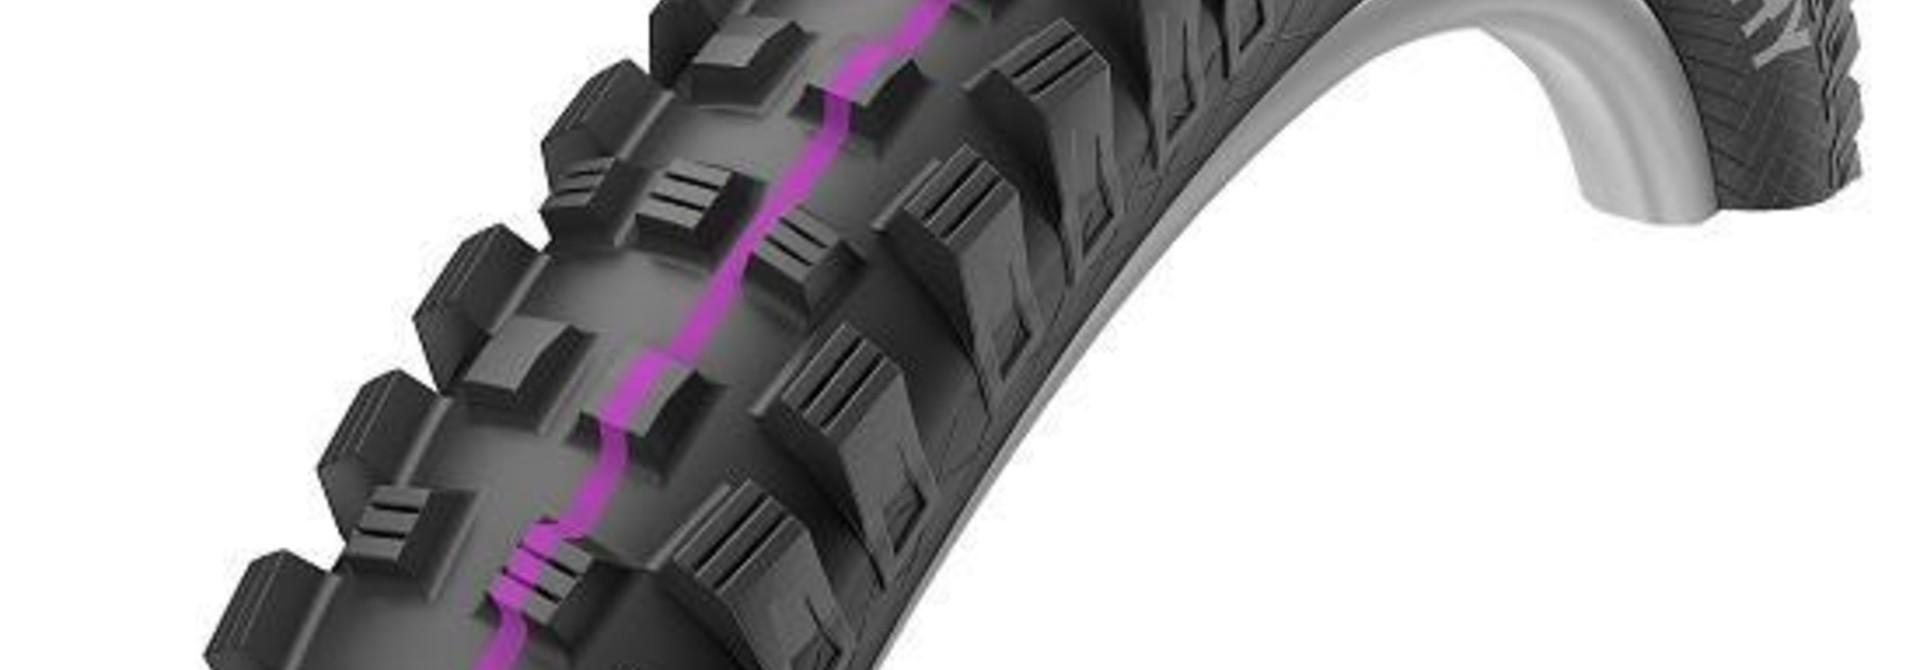 Schwalbe Magic Mary Tire, 27.5 x 2.35 (60-584), Downhill, Addix Ultra Soft, Wire